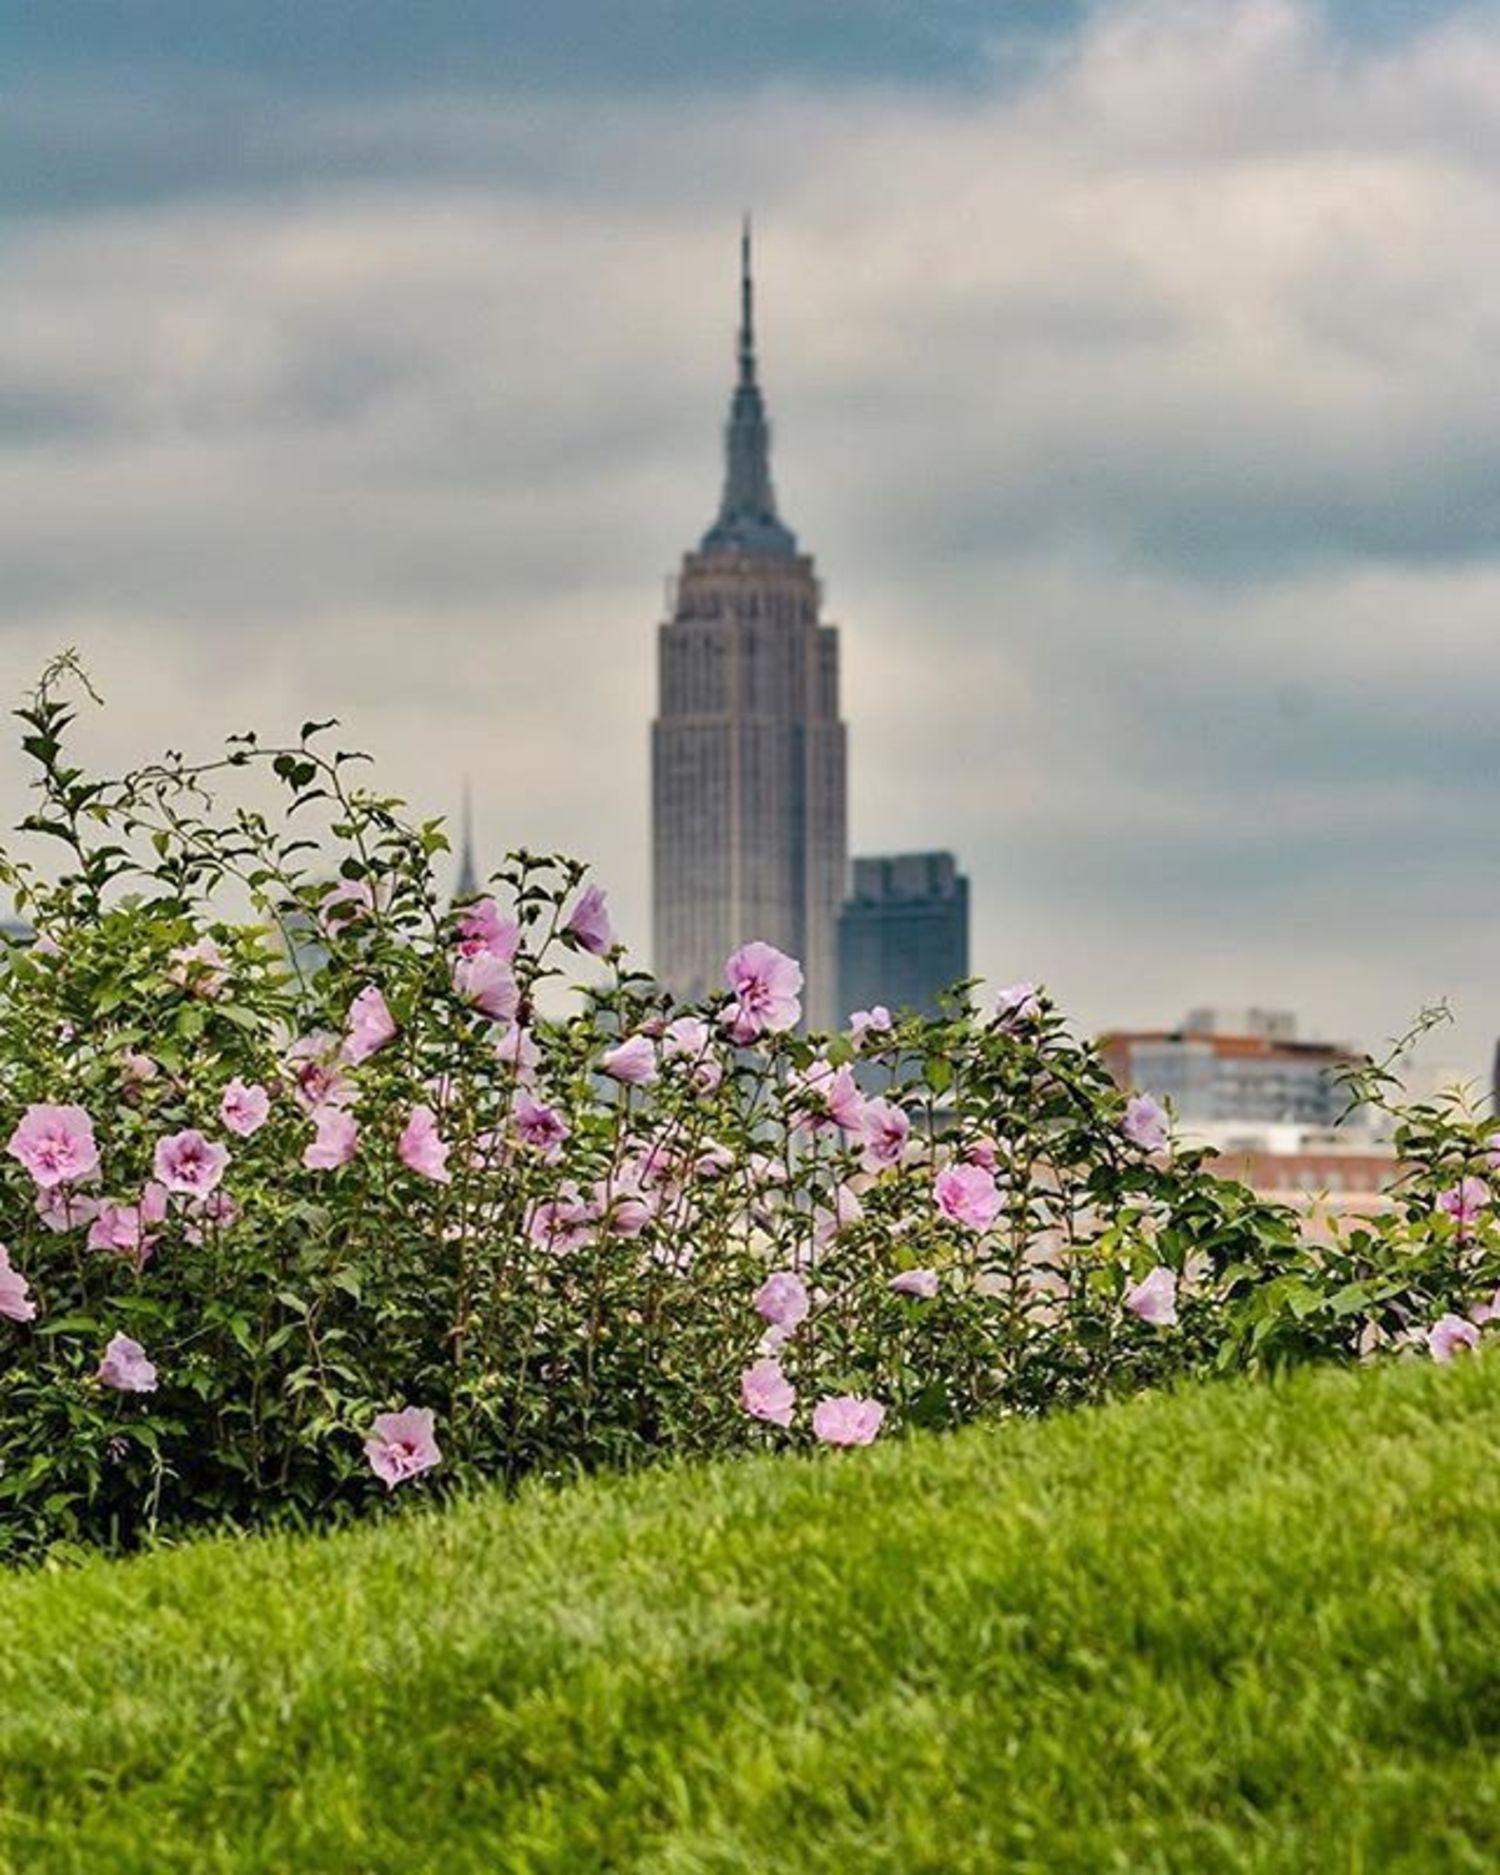 Empire State Building, New York, New York. Photo via @eyecatchingphoto #viewingnyc #newyorkcity #newyork